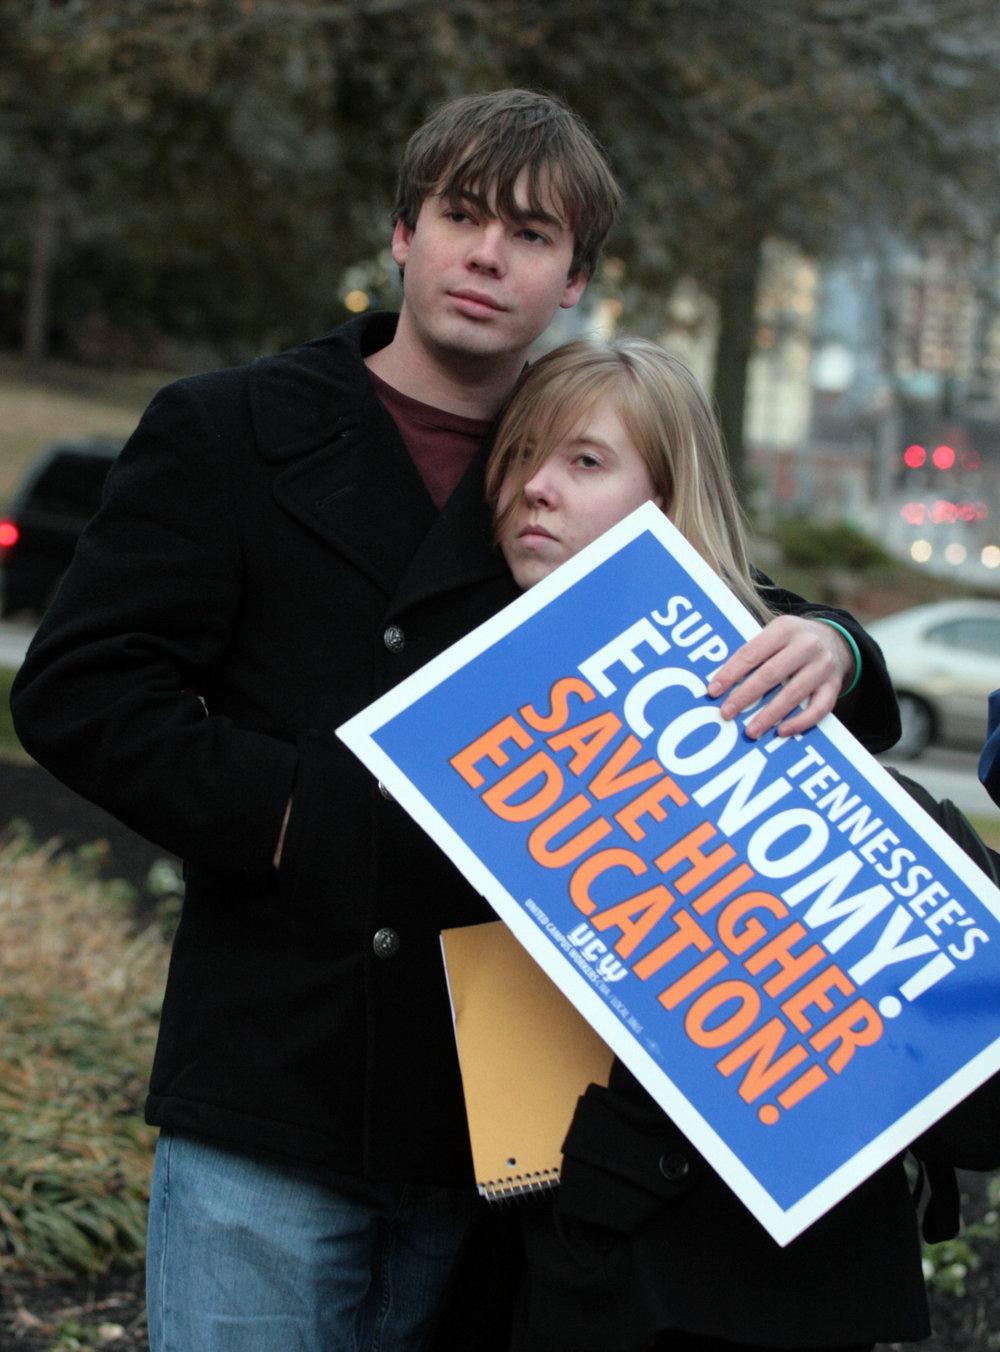 Budget Cuts Protest